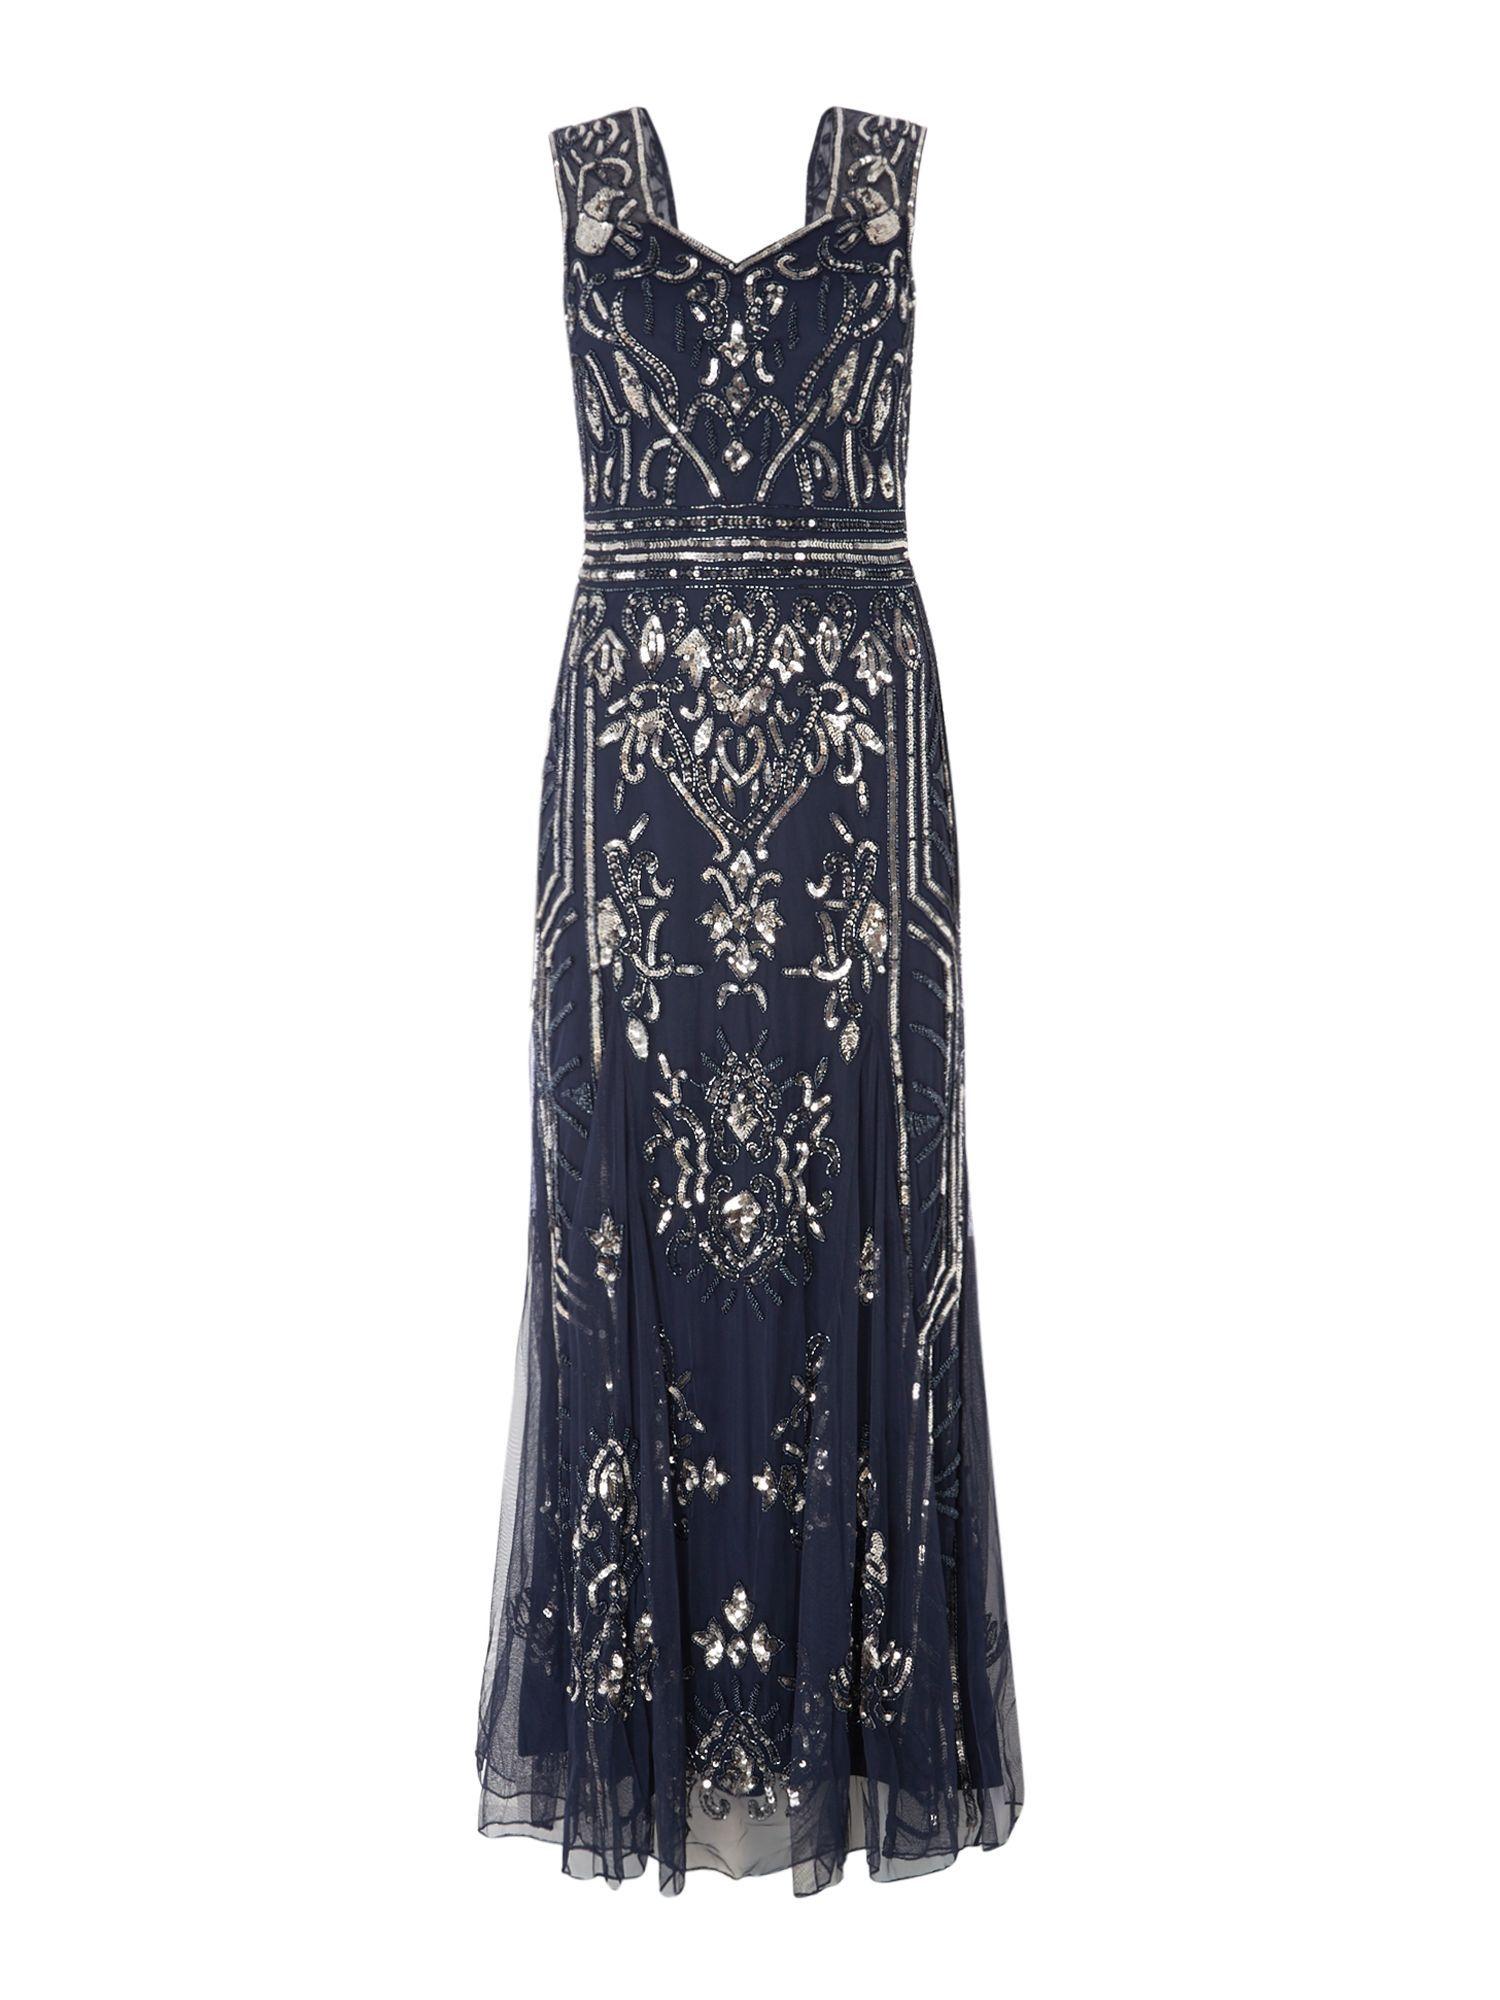 1920s Dresses Uk Flapper Gatsby Downton Abbey Dress Beautiful Lace Dresses Flapper Dress Uk Dresses